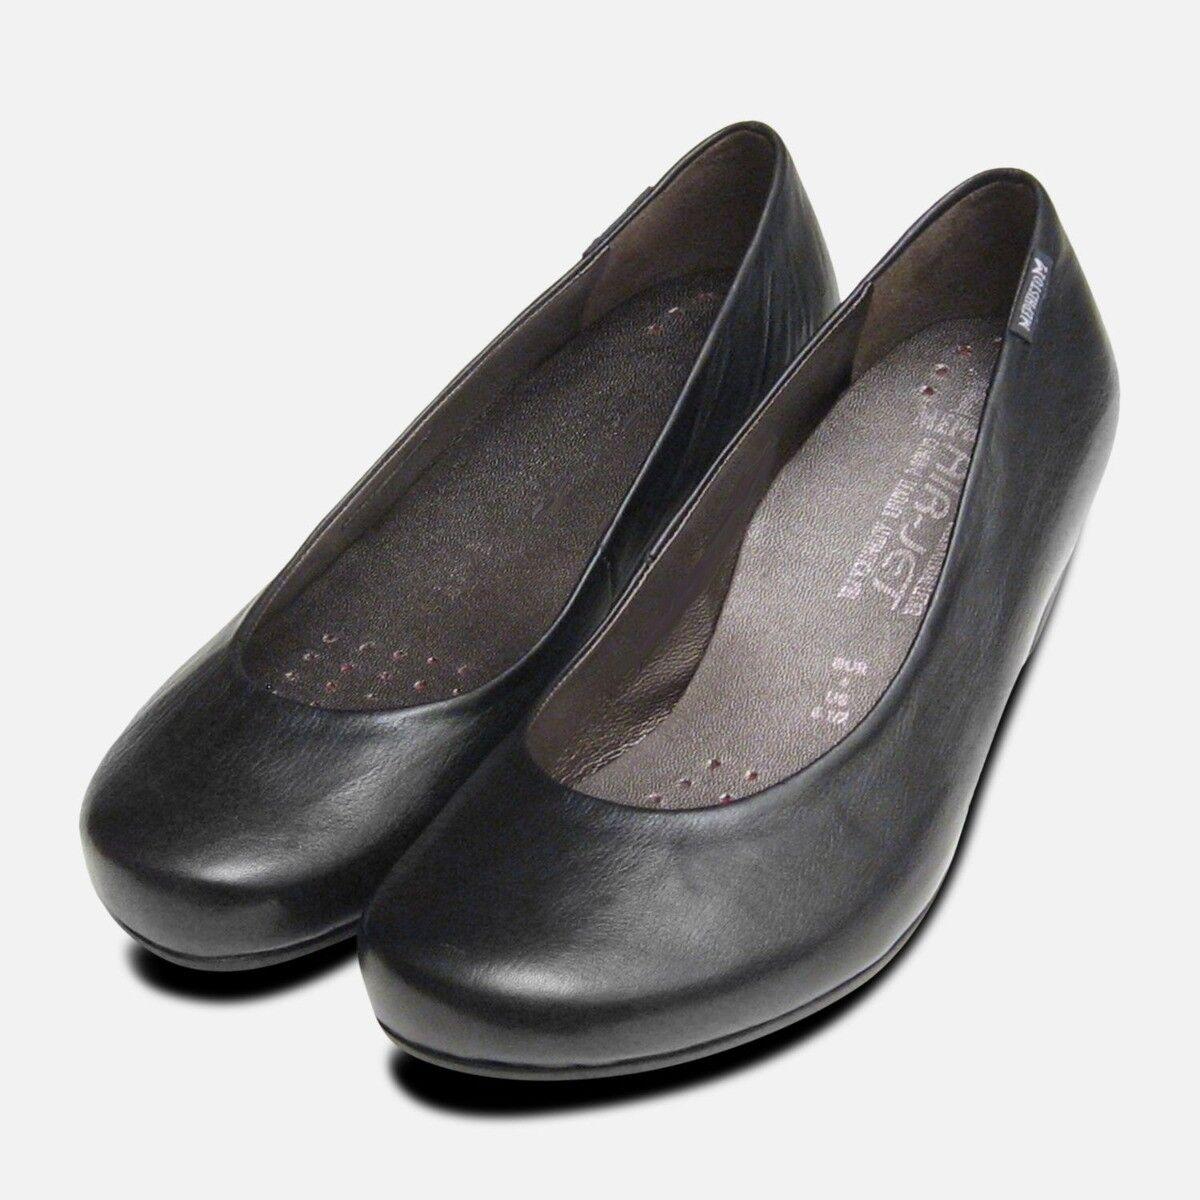 Mephisto Mephisto Mephisto Rosie De Lujo Negra Court zapatos  precios bajos